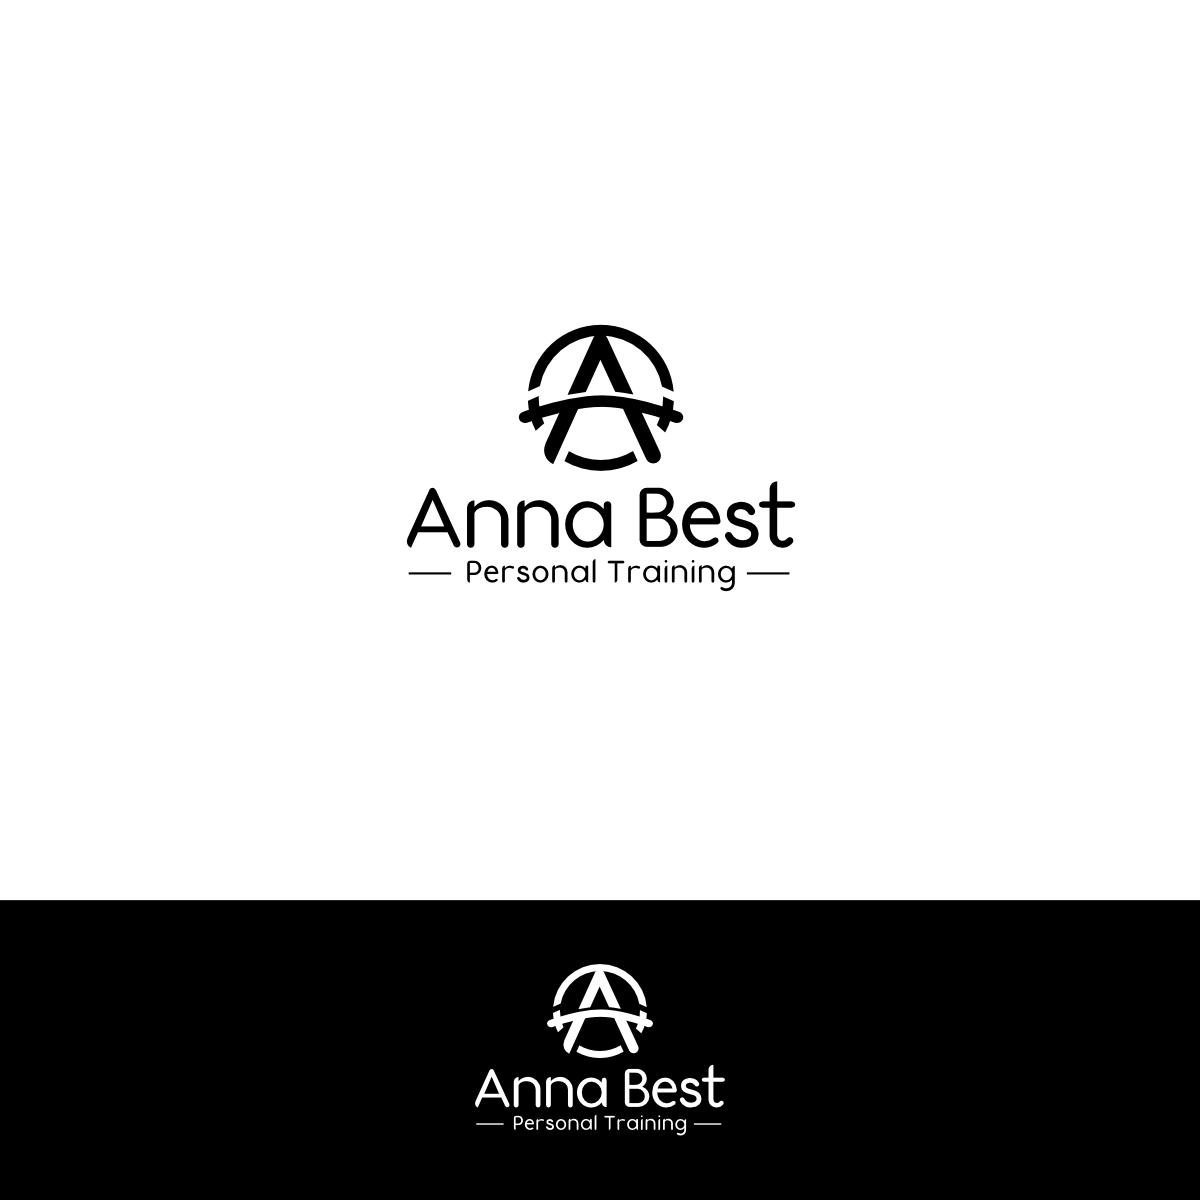 Modern Colorful Fitness Logo Design For Anna Best